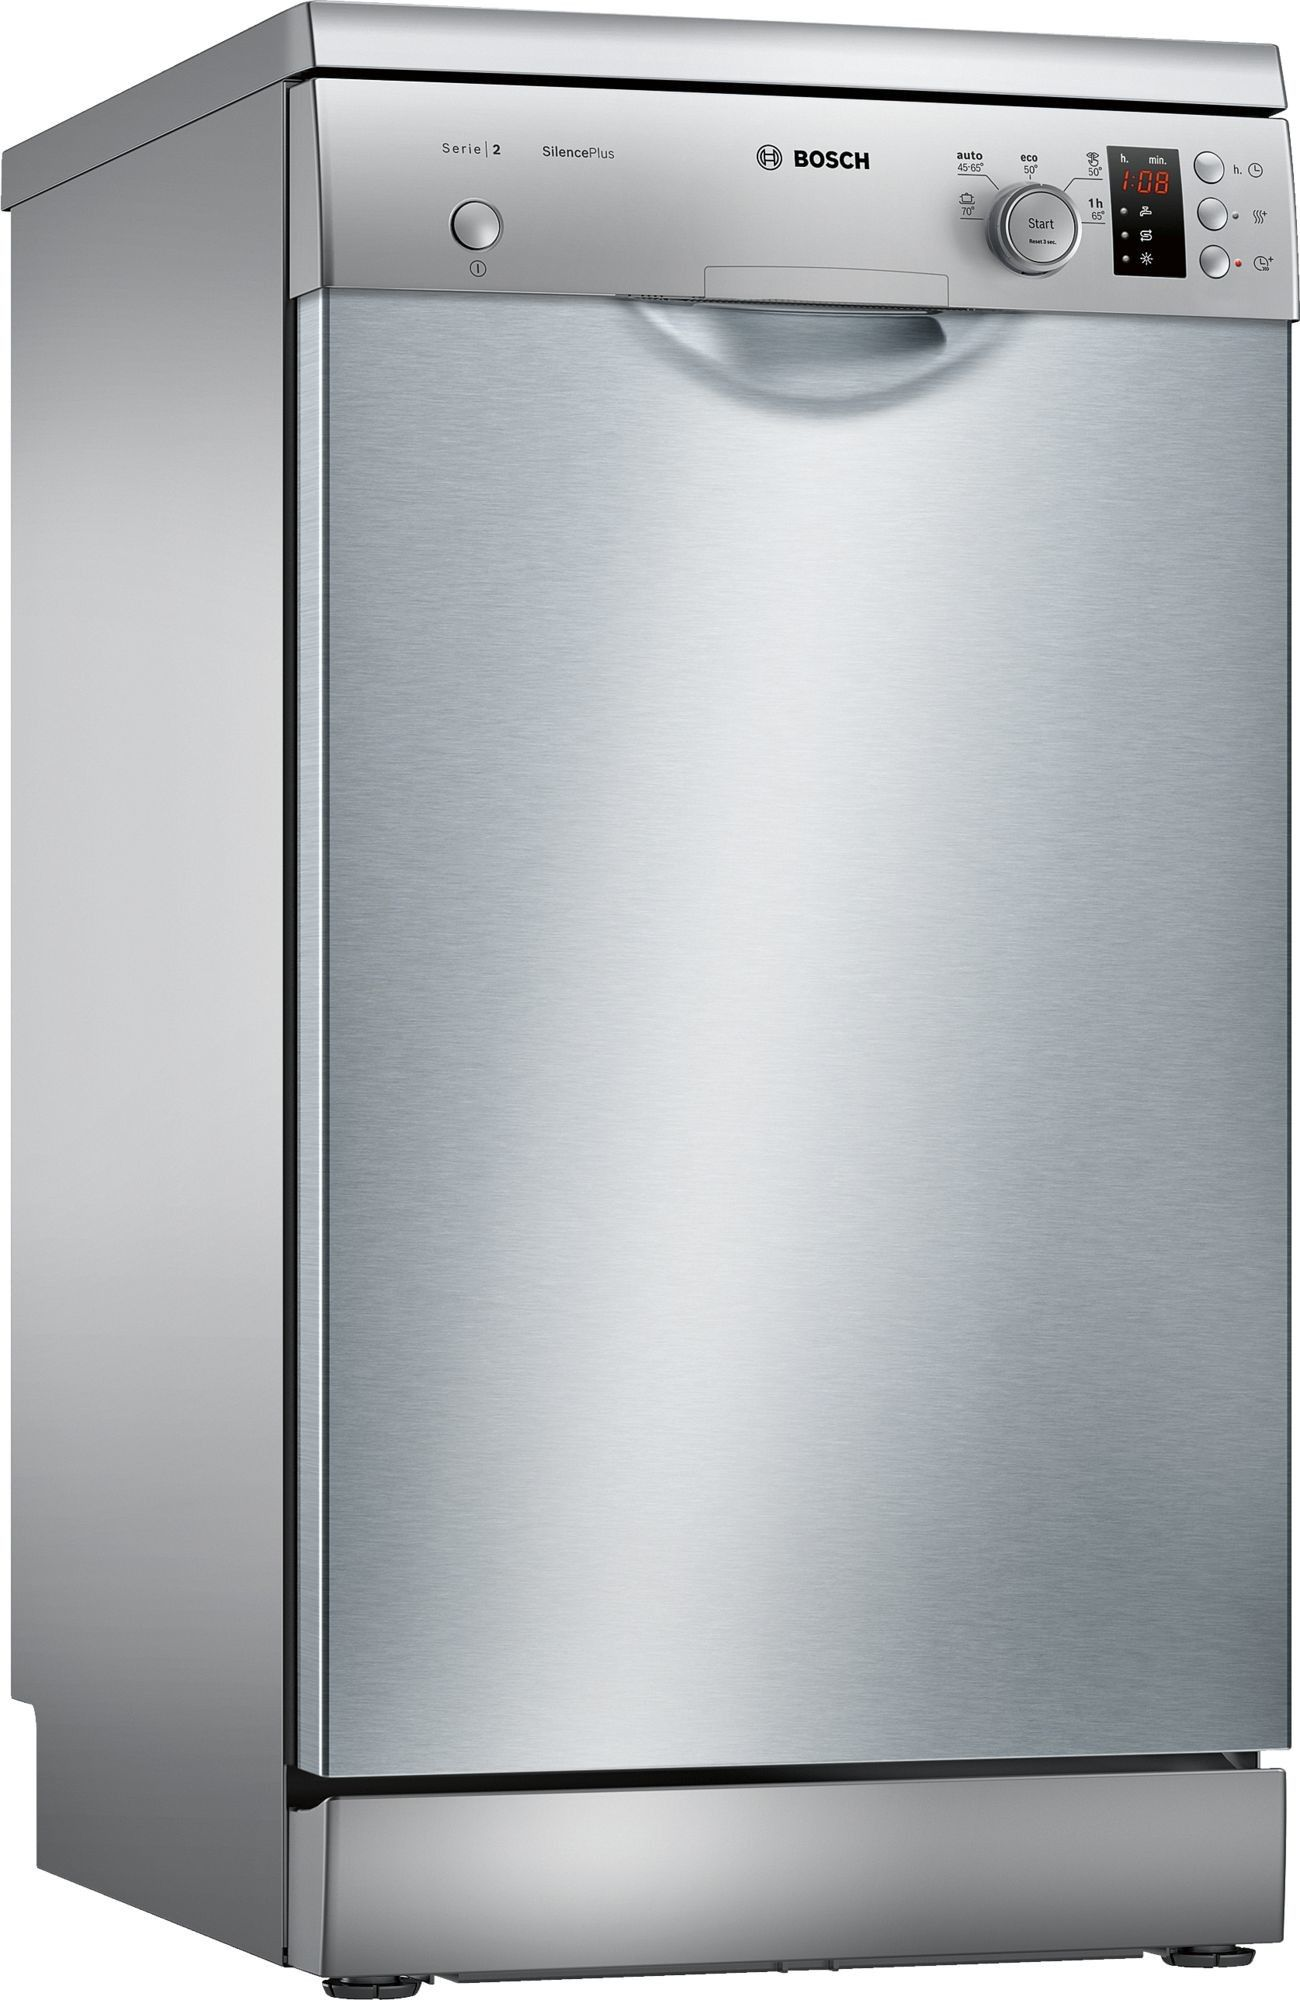 Bosch Serie 2 Sps25ci07e Freestanding 9 Place Settings A Dishwasher 670 00 Bosch Https Integrated Dishwasher Freestanding Dishwashers Bosch Dishwashers